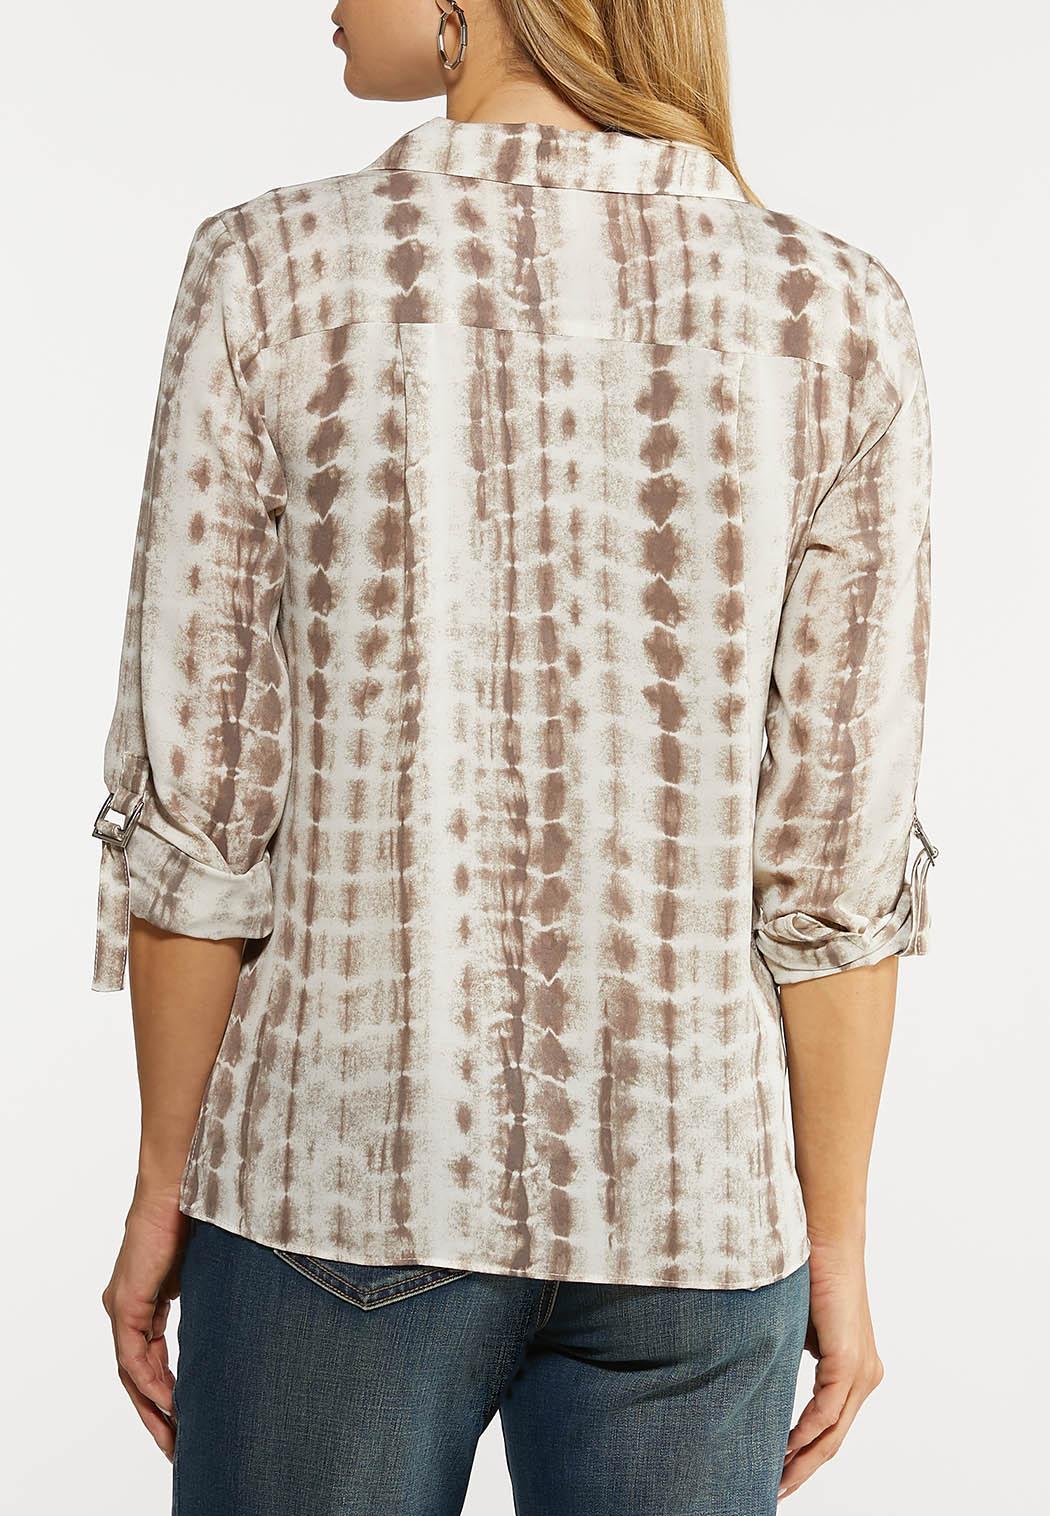 Plus Size Earthy Tie Dye Shirt (Item #44103129)